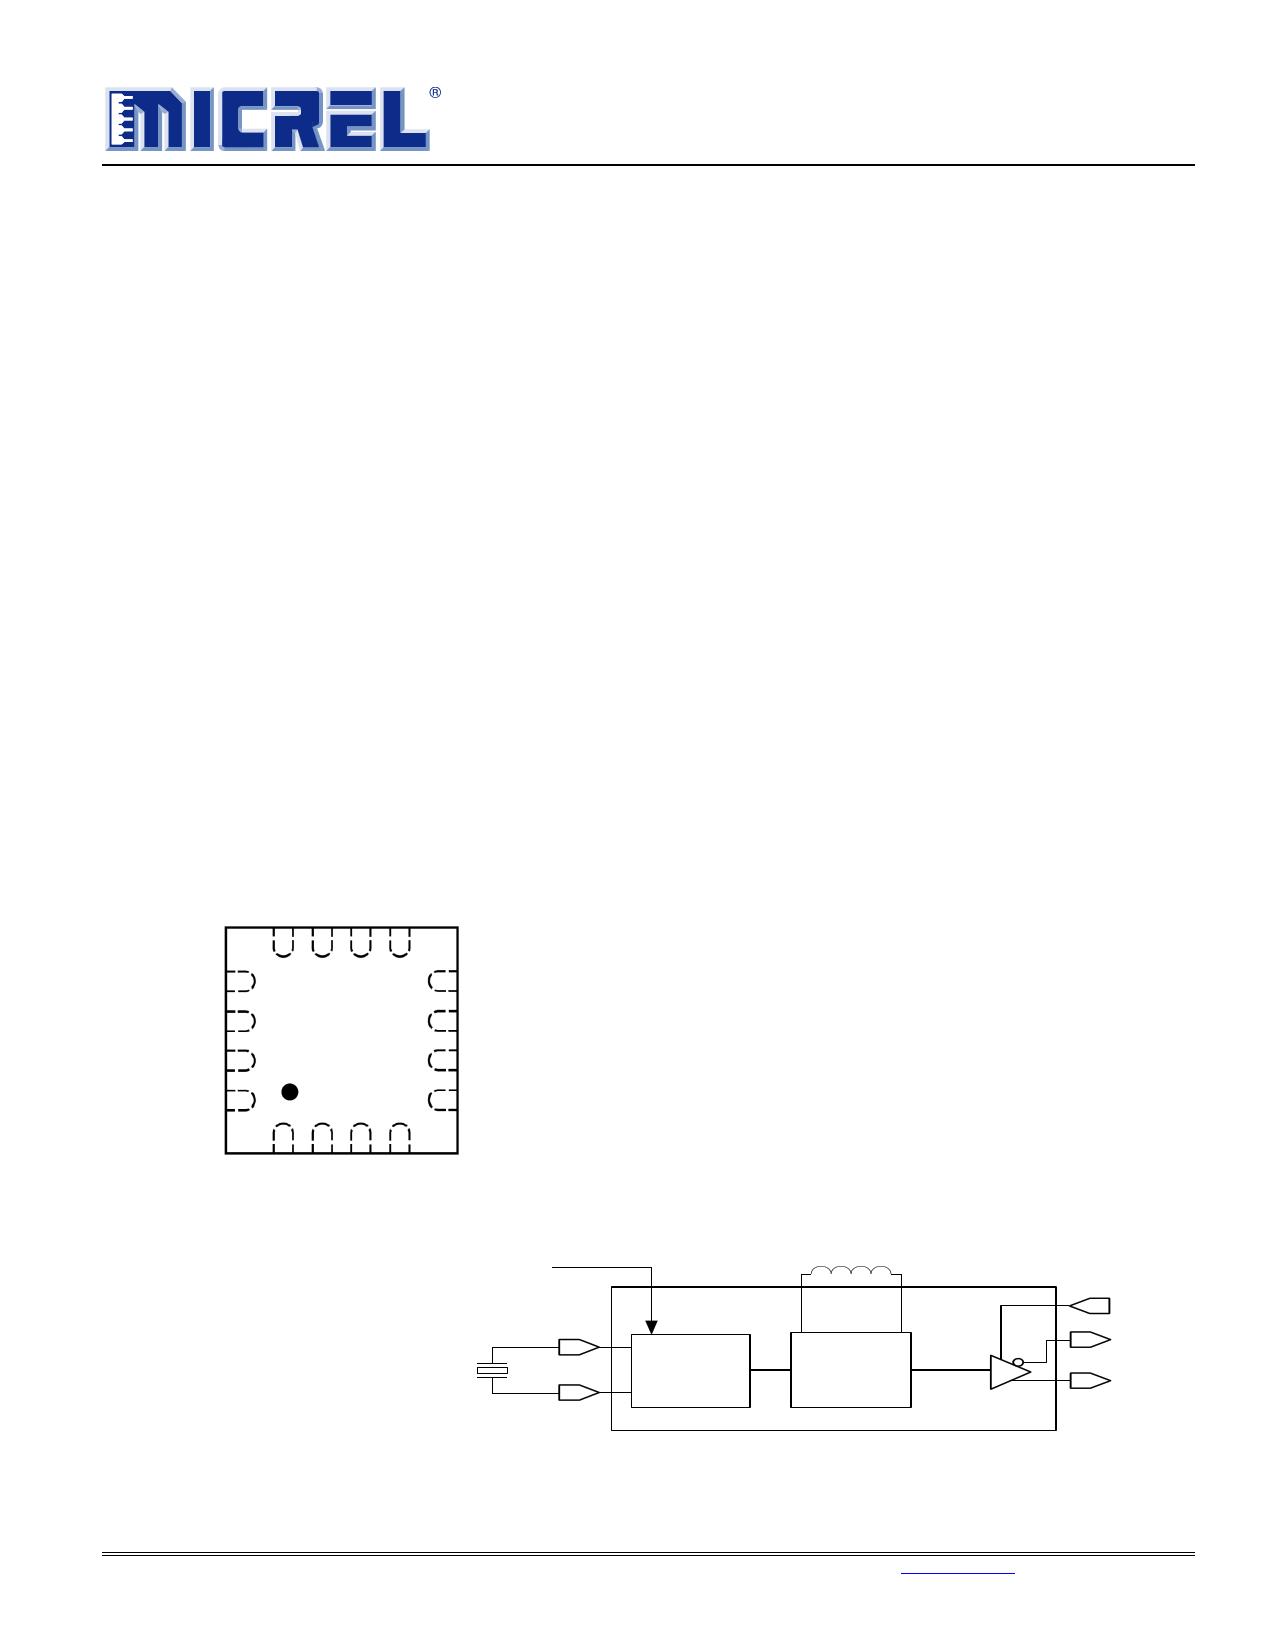 PL565-68 데이터시트 및 PL565-68 PDF